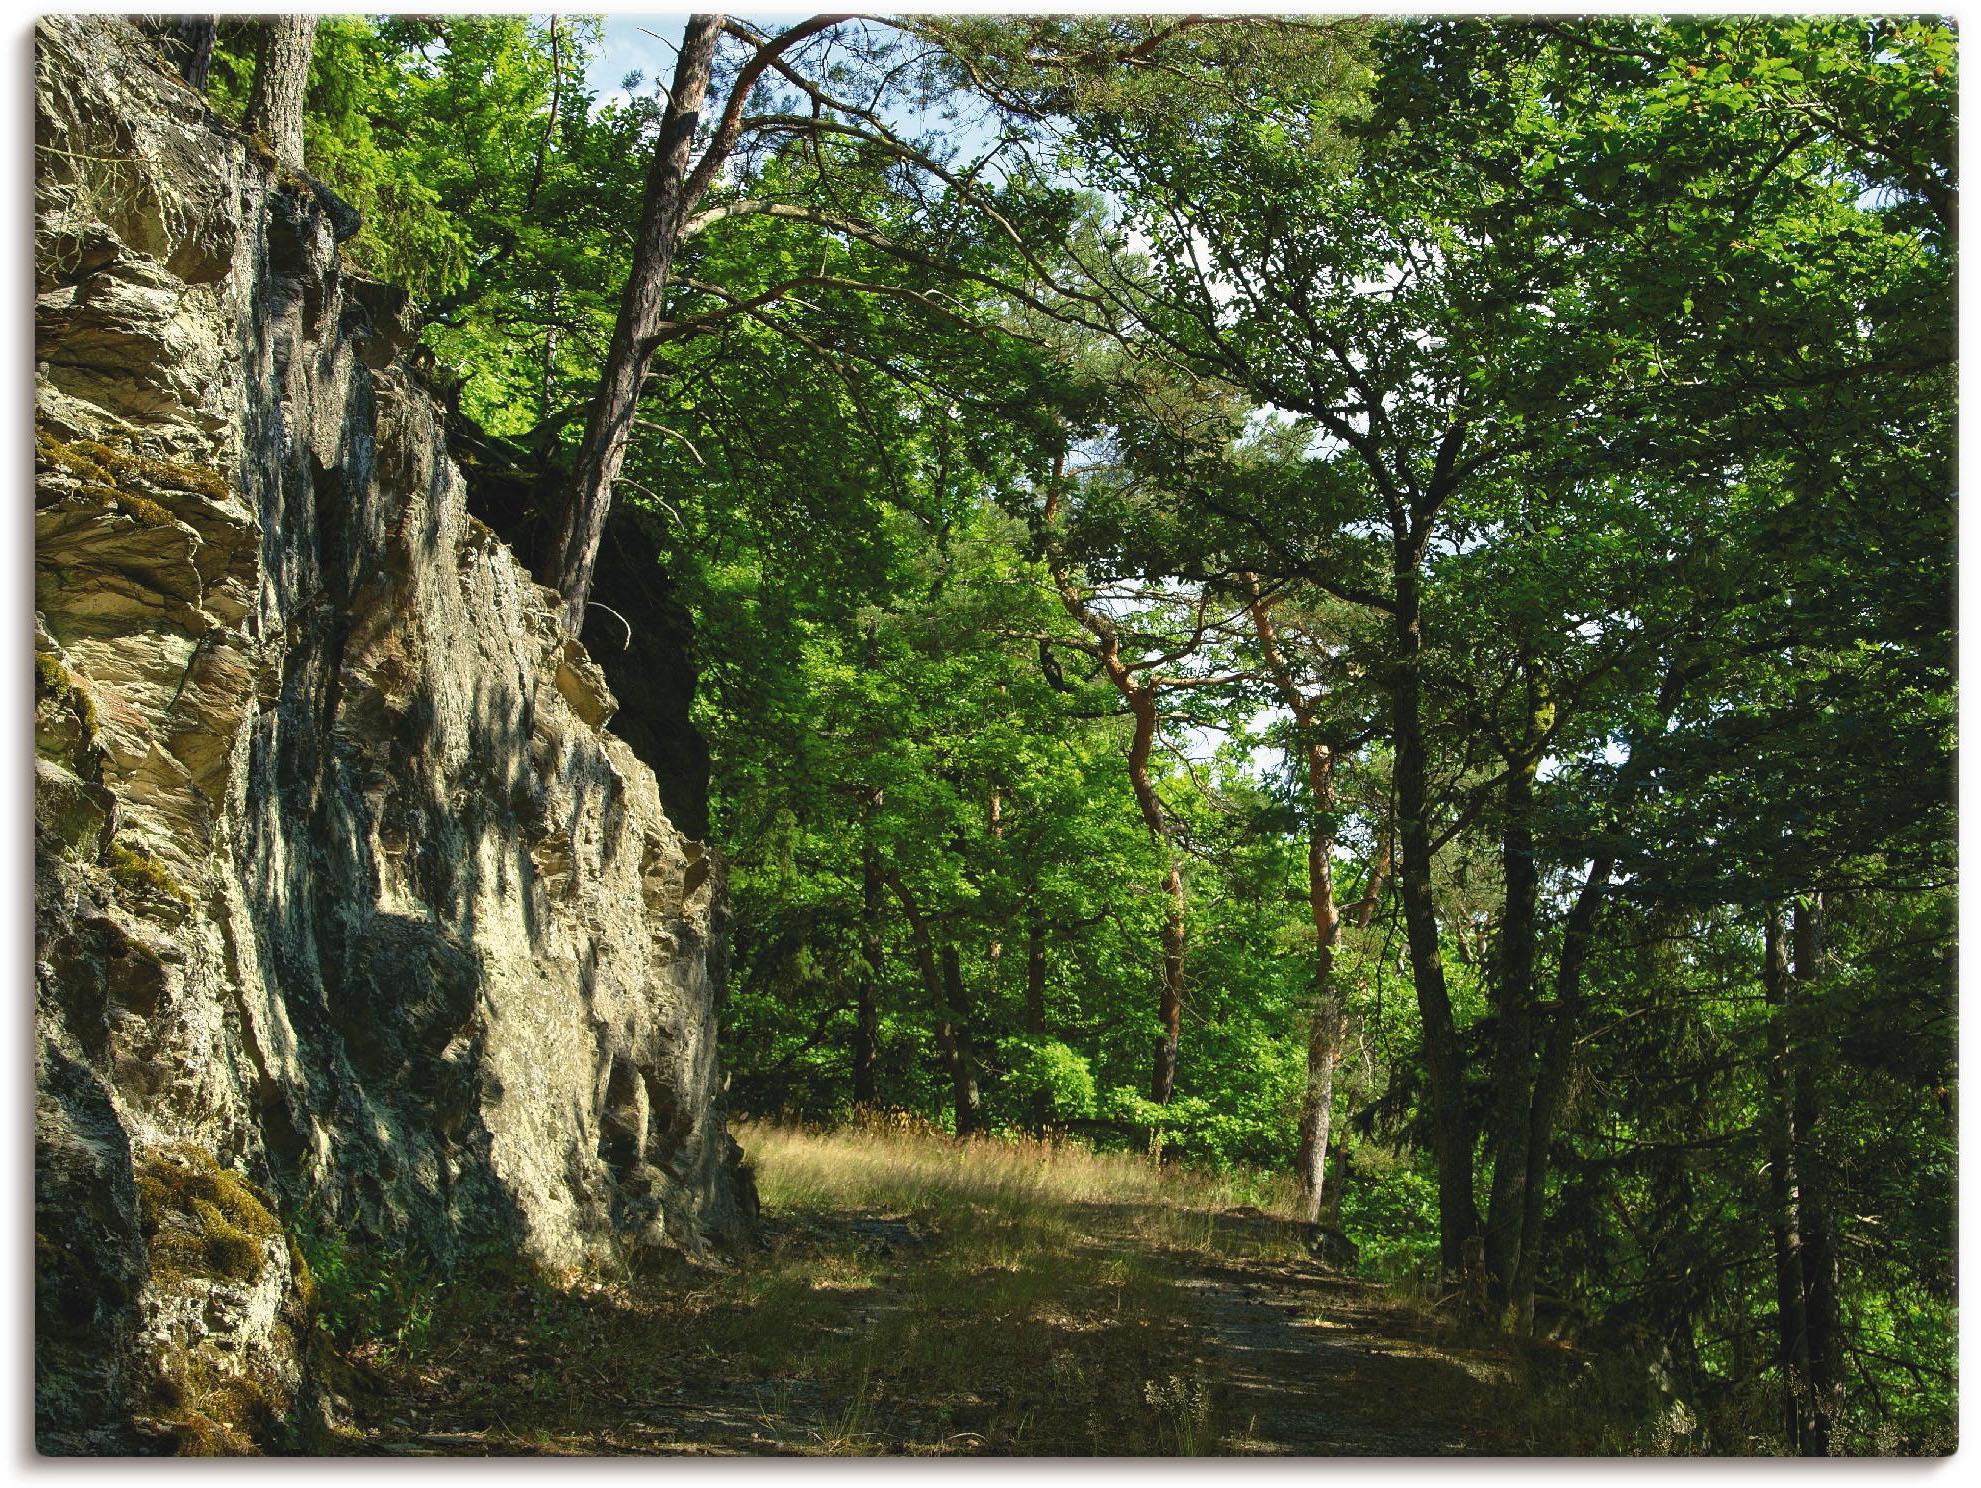 Artland Wandbild »Waldweg am Felsen« | Dekoration > Bilder und Rahmen | Artland